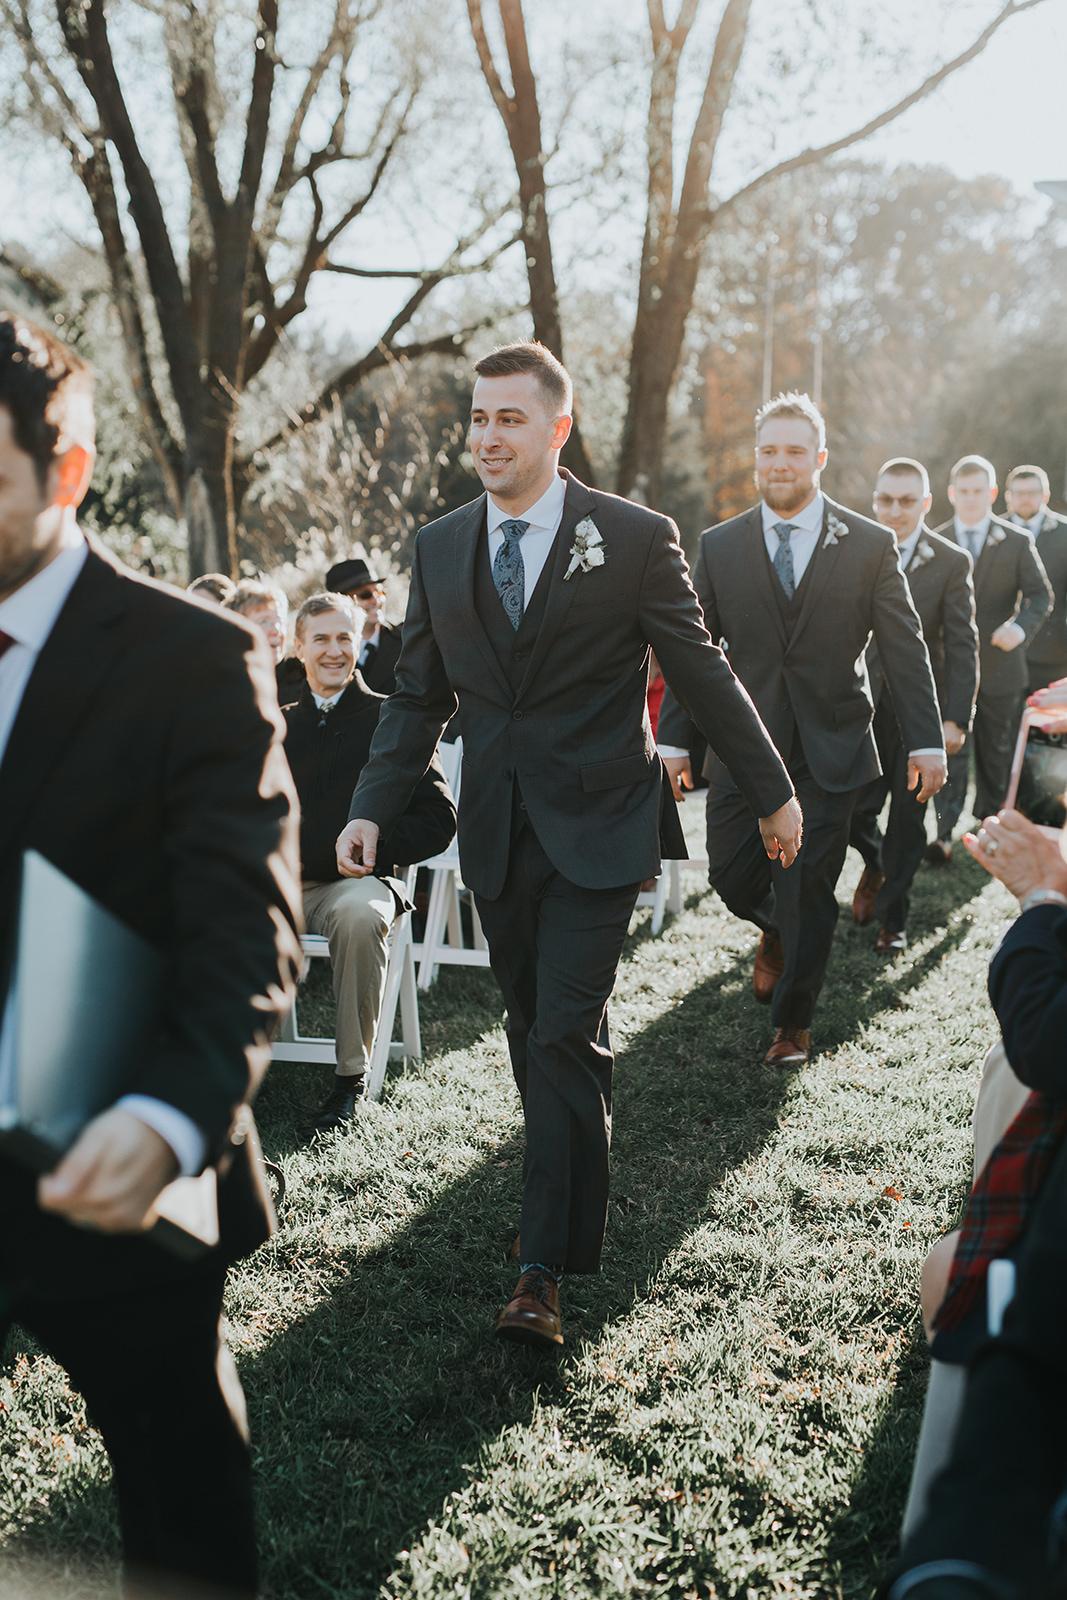 brielle-davis-events-48-fields-wedding-ceremony-groom.jpg